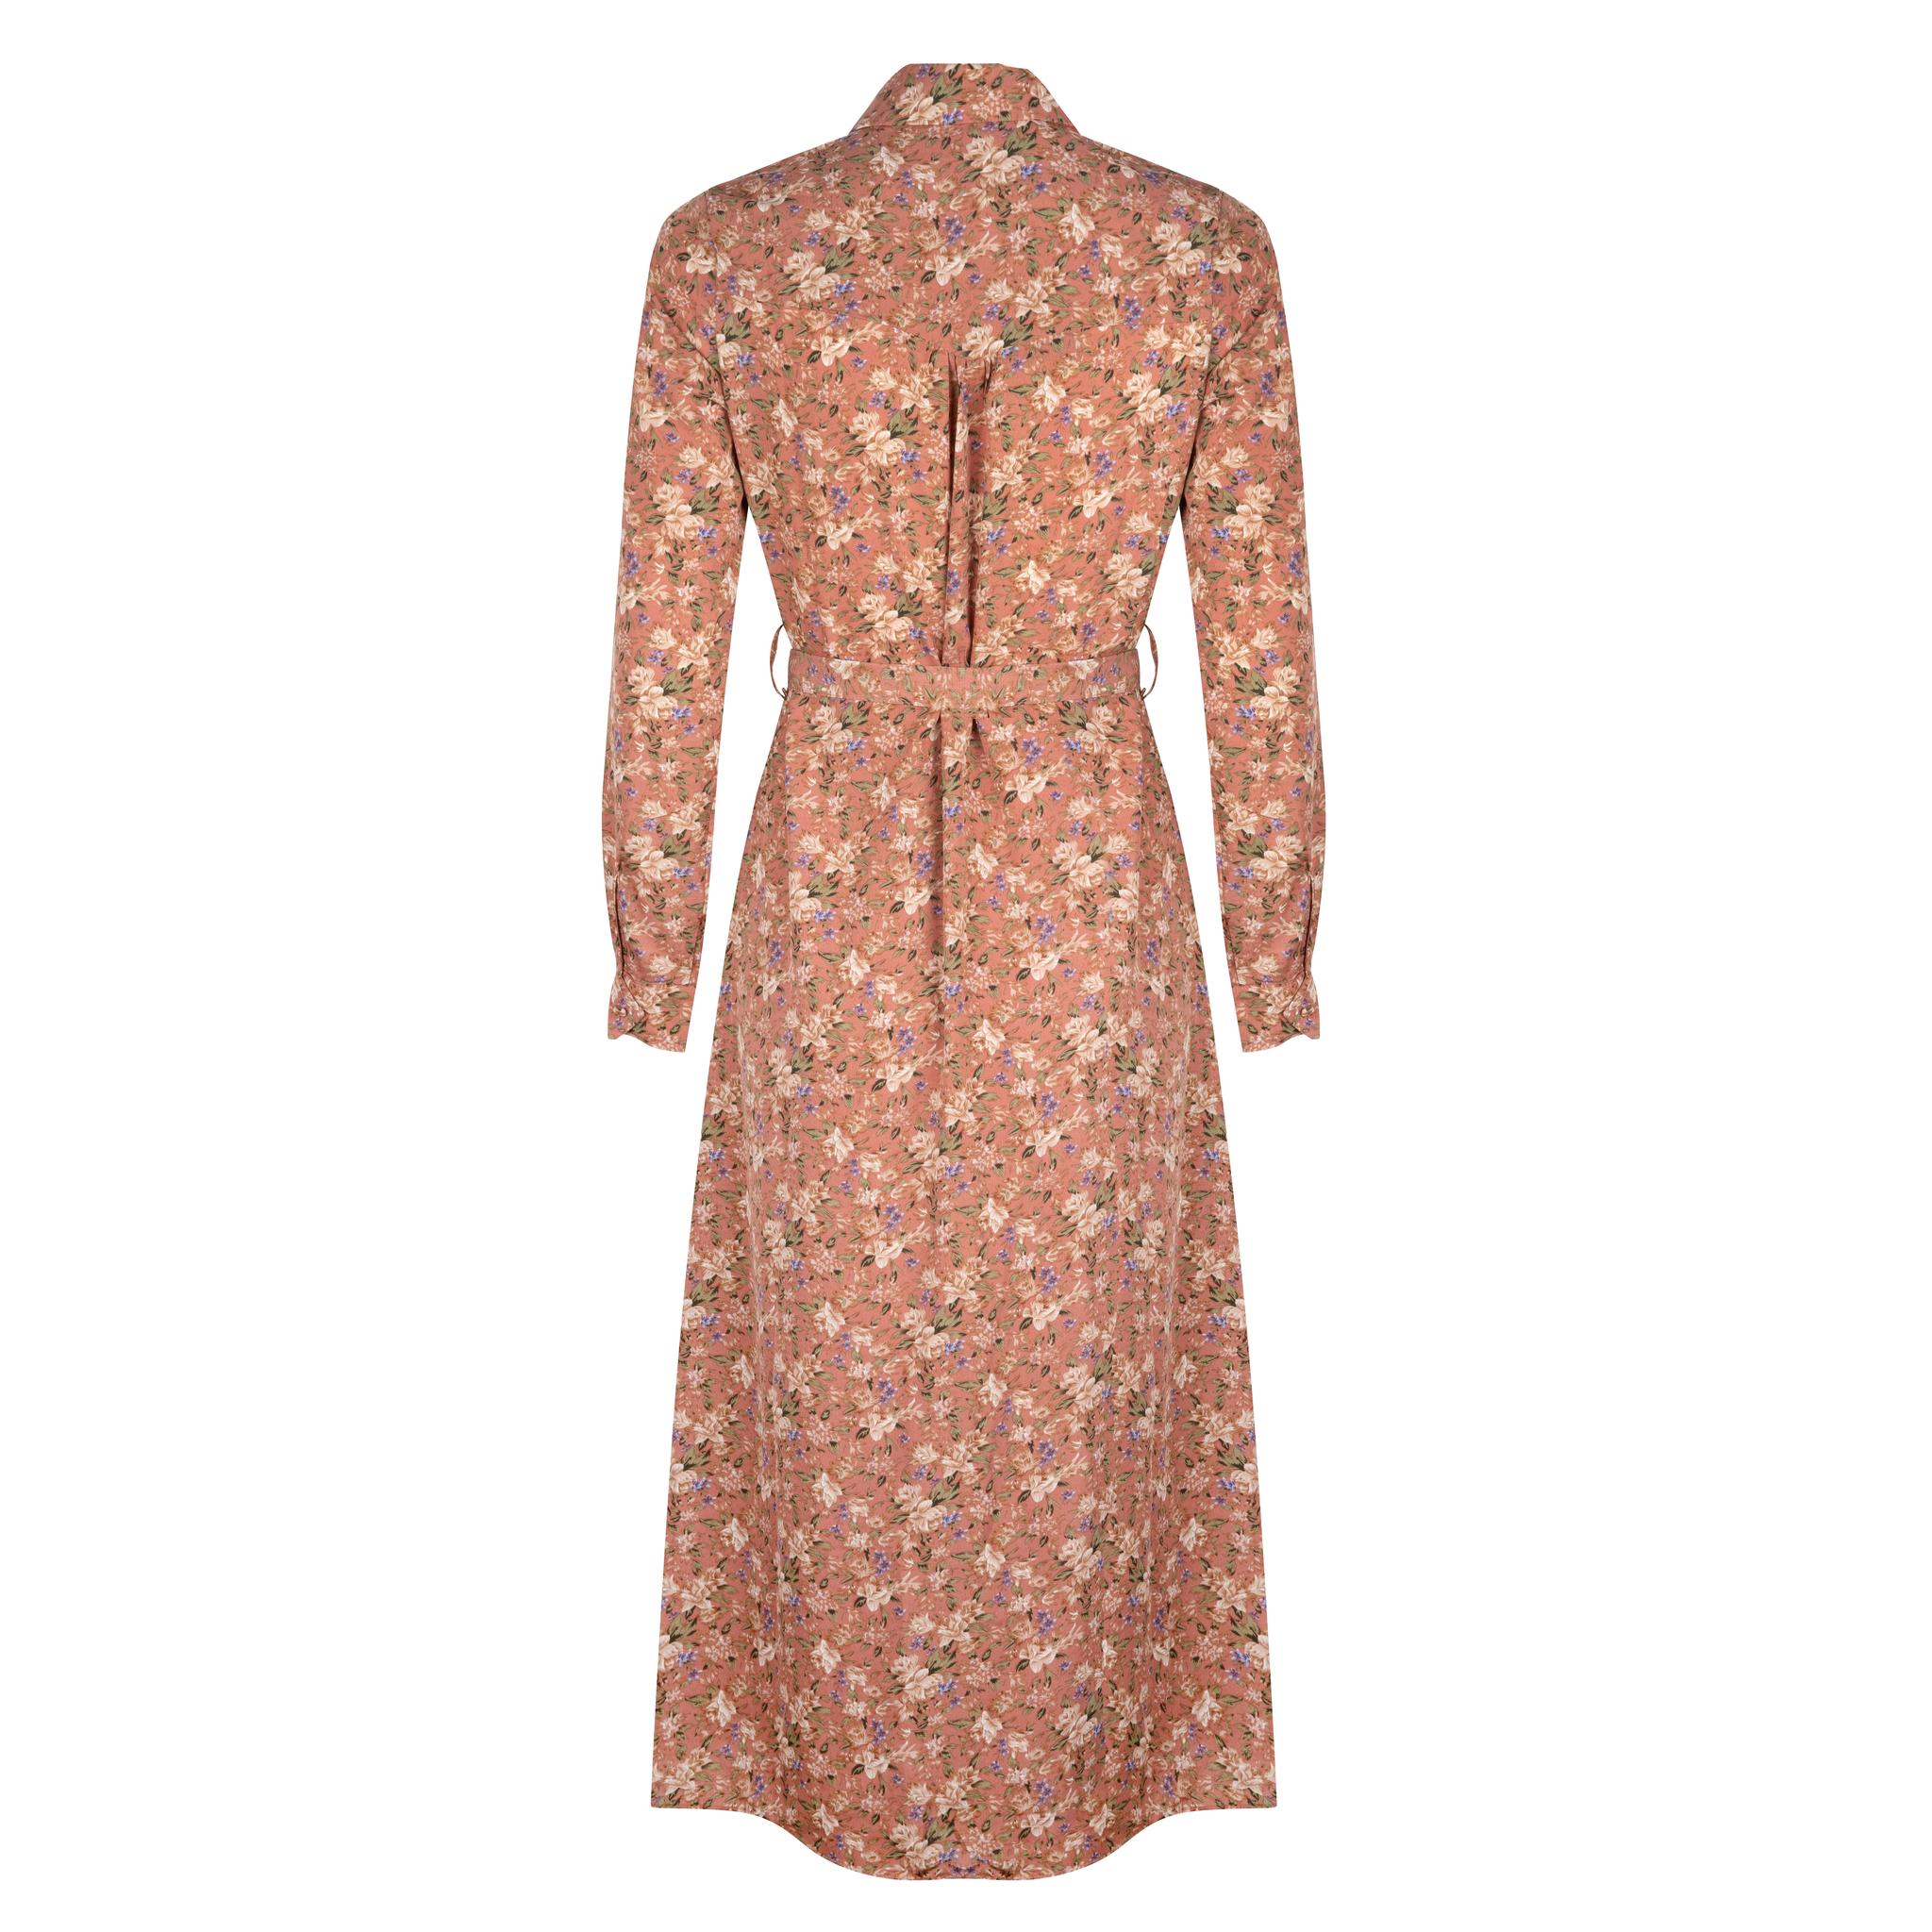 Lofty Manner Pink Floral Print Dress Daisy